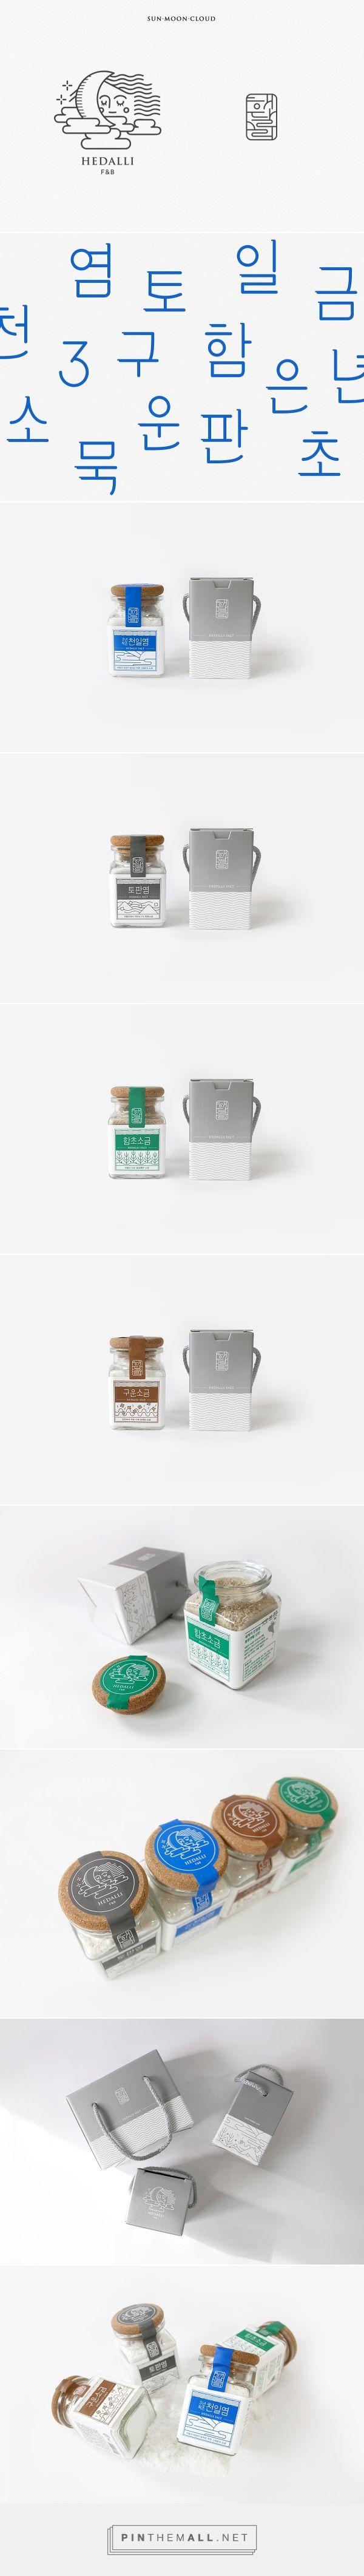 HEDALLI F&B Branding & Packaging on Behance- https://www.behance.net/gallery/29986069/HEDALLI-F-B-Branding-Packaging - created via https://pinthemall.net